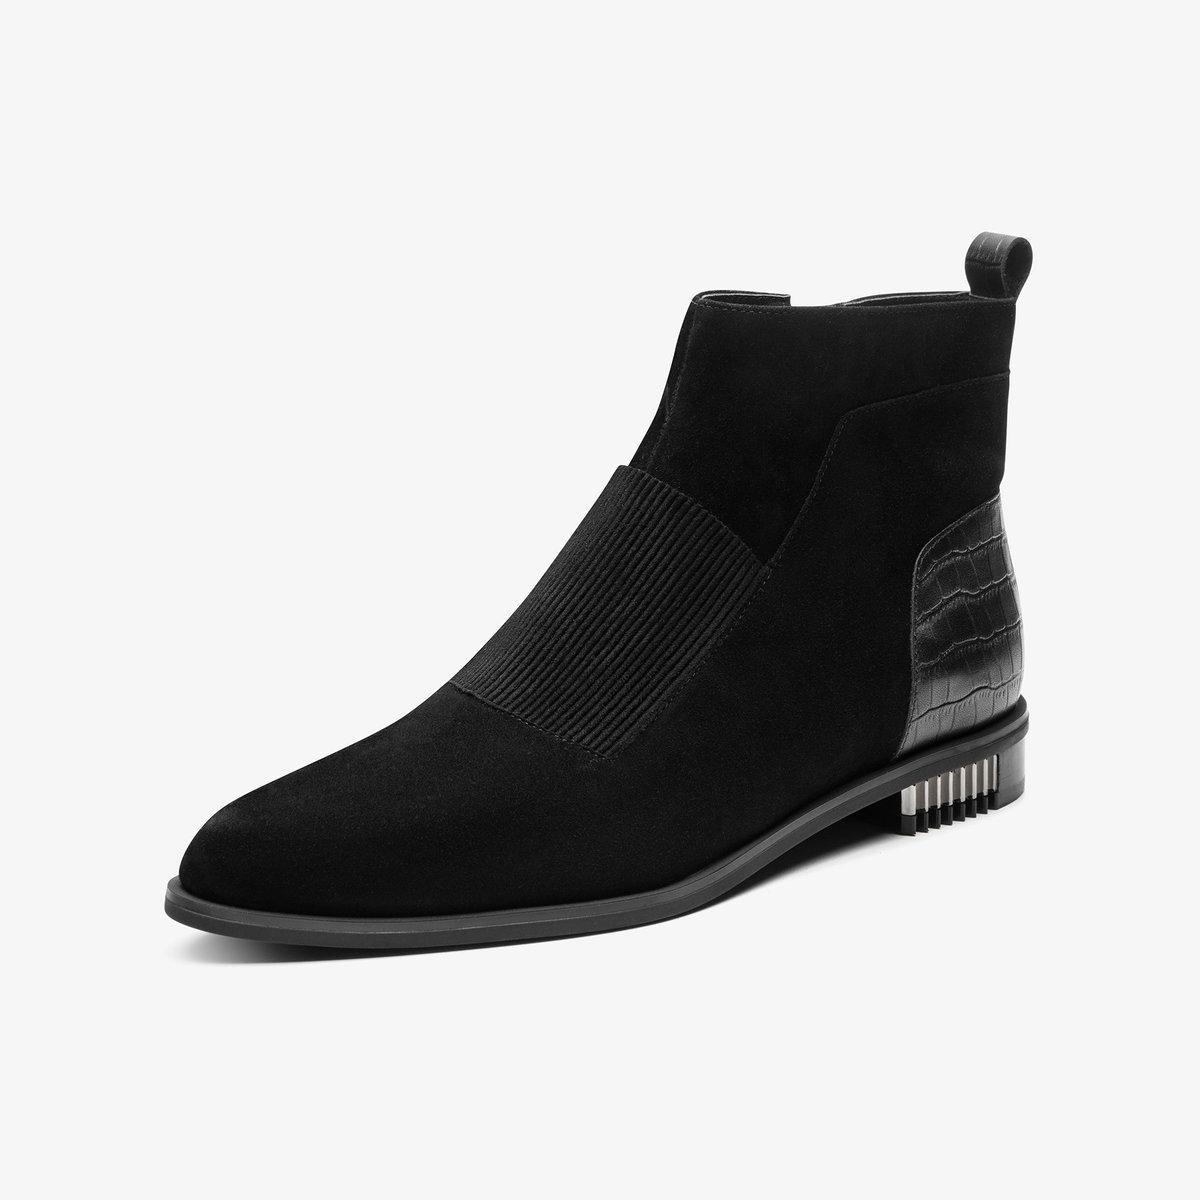 Black unisex flat suede boot